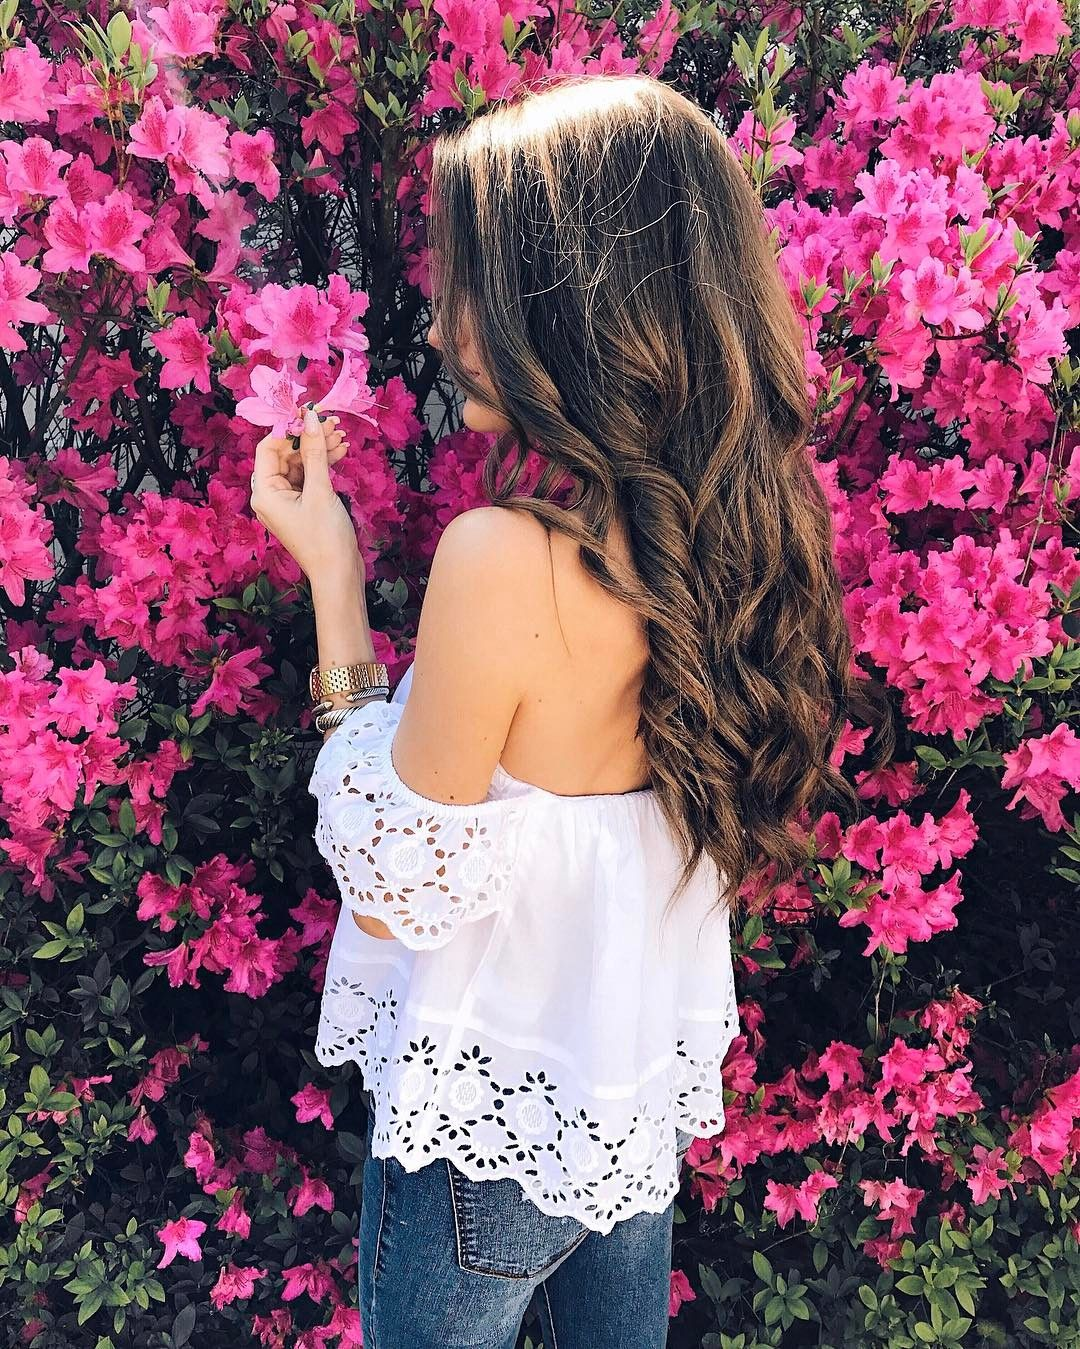 Картинки девушки с цветами на аву